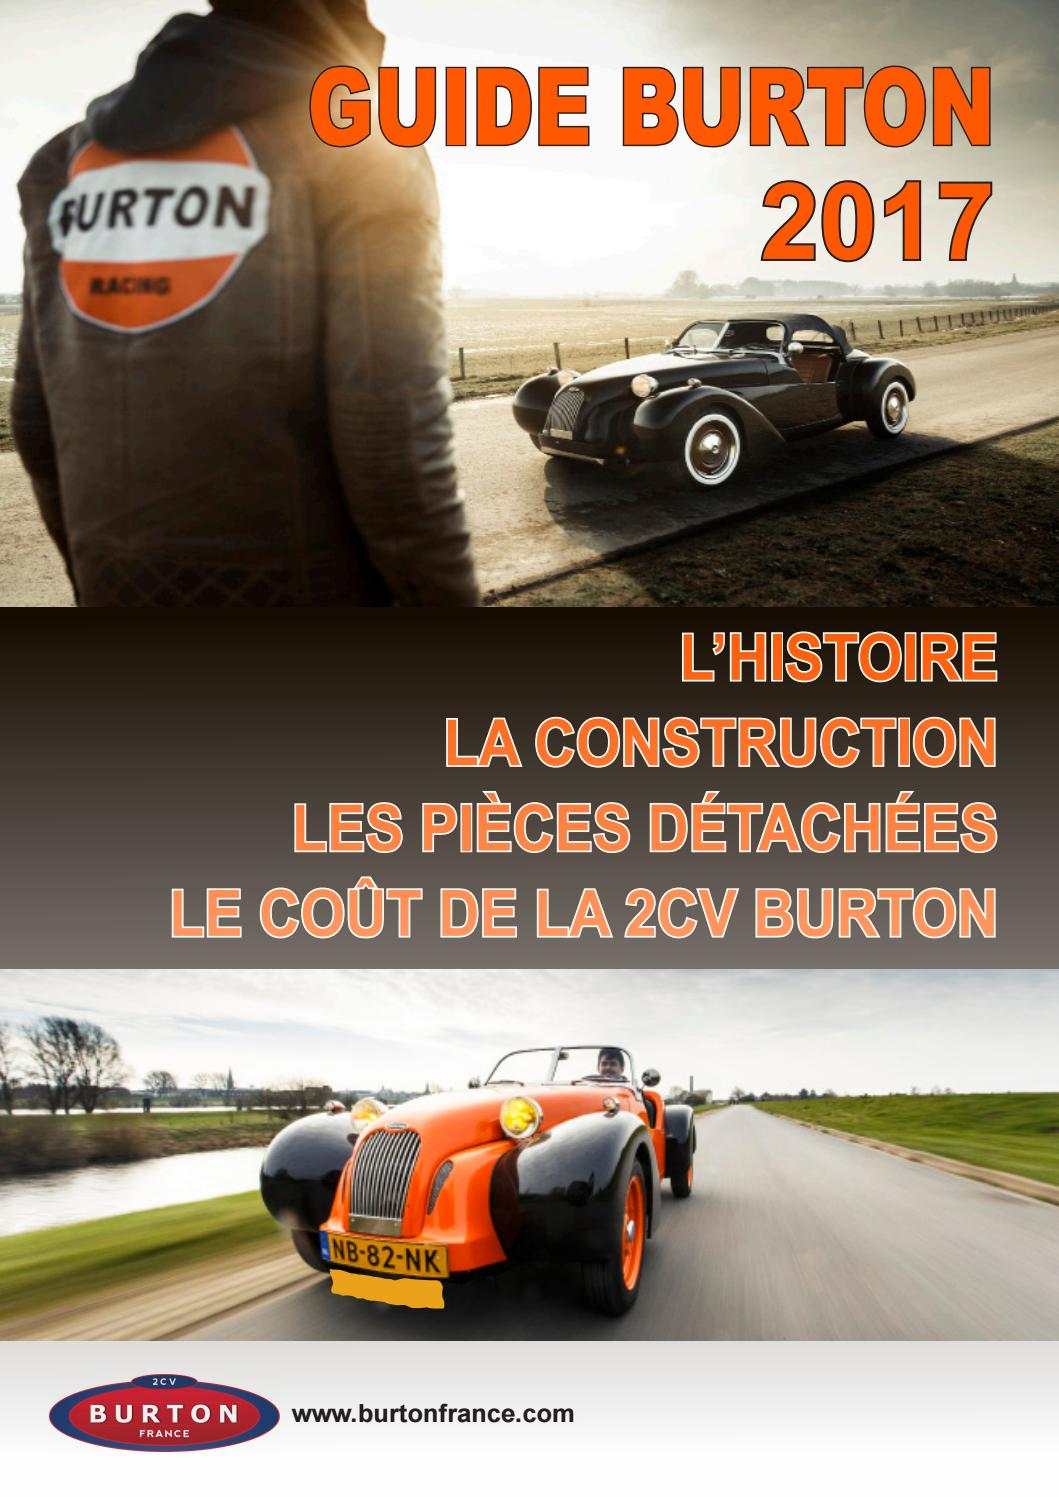 guide 2cv burton voiture de sport 2017 by 2cv burton